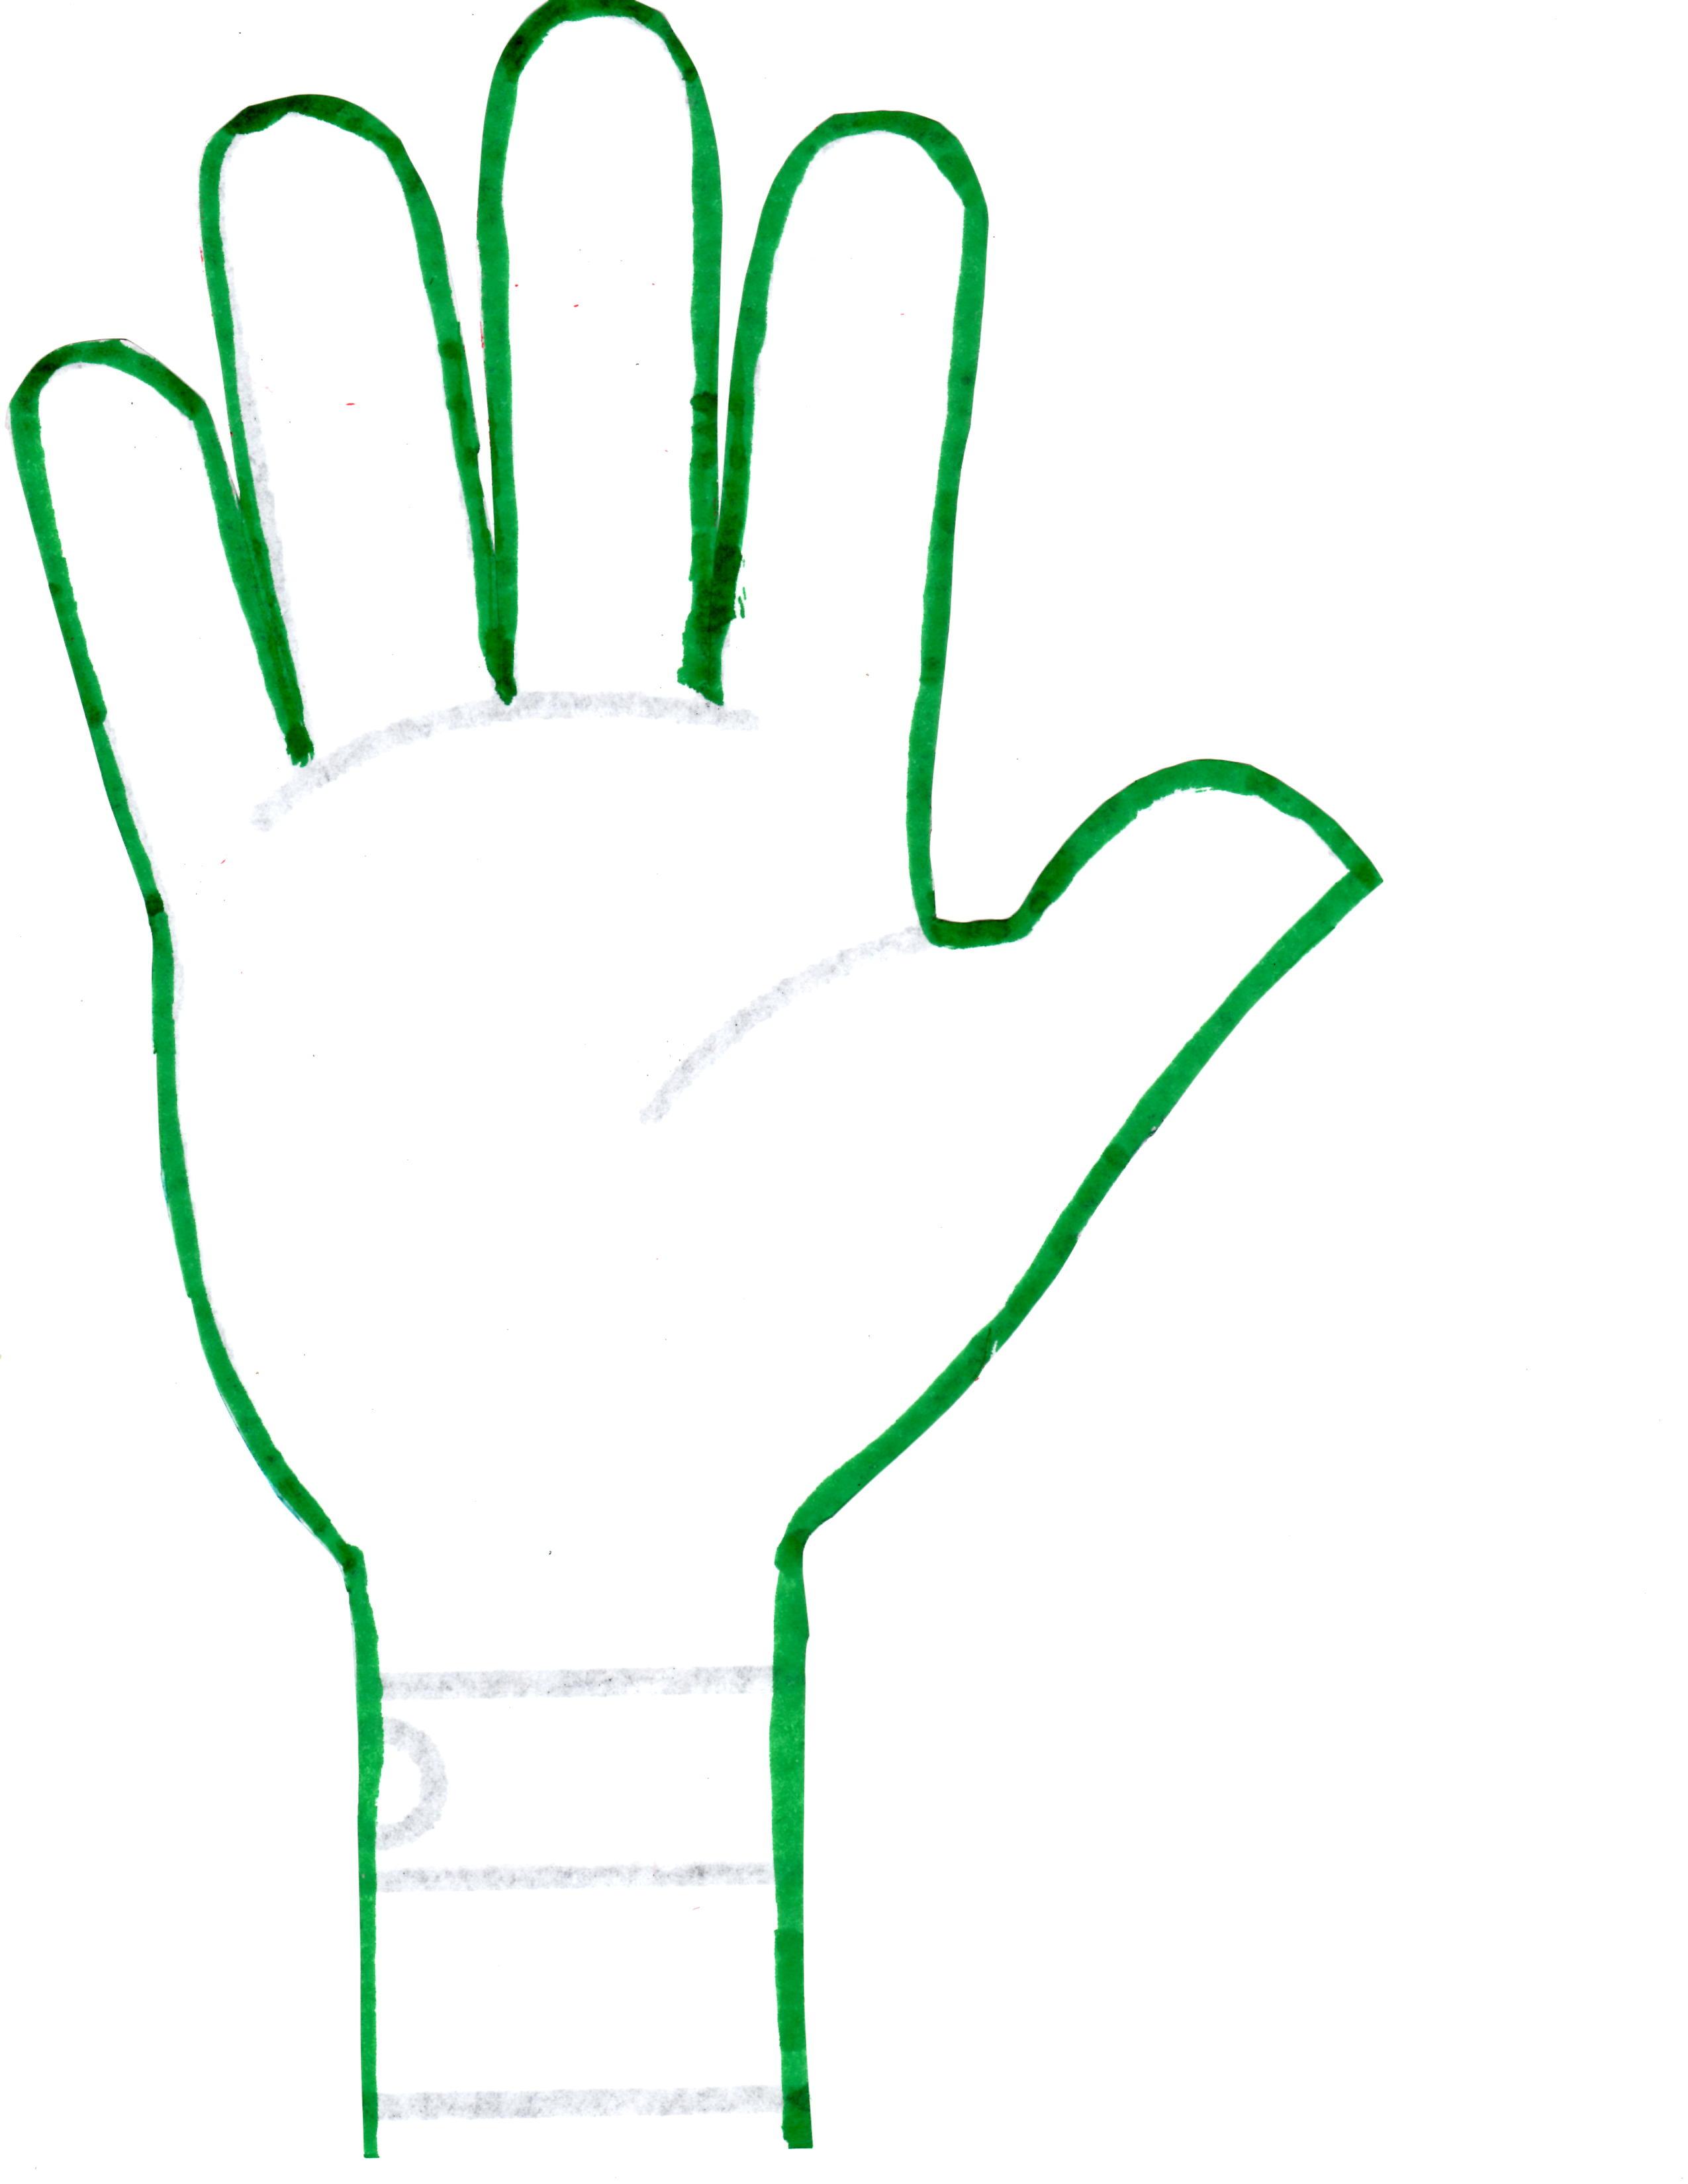 2 Hands Template Clipart.